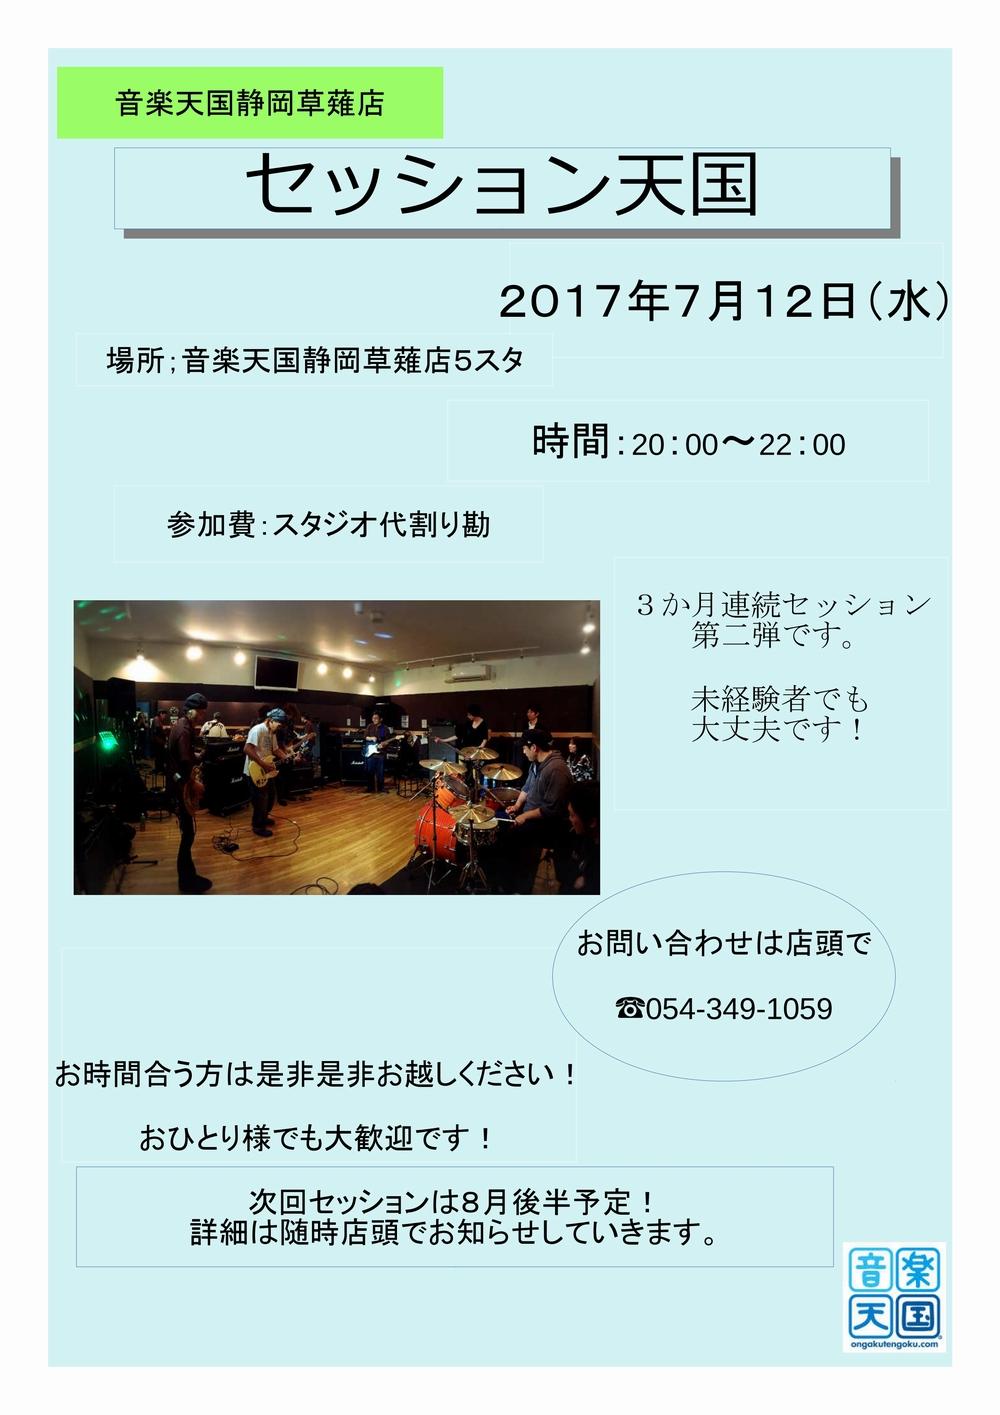 【セッション天国】音楽天国・静岡草薙店7月12日(水)開催